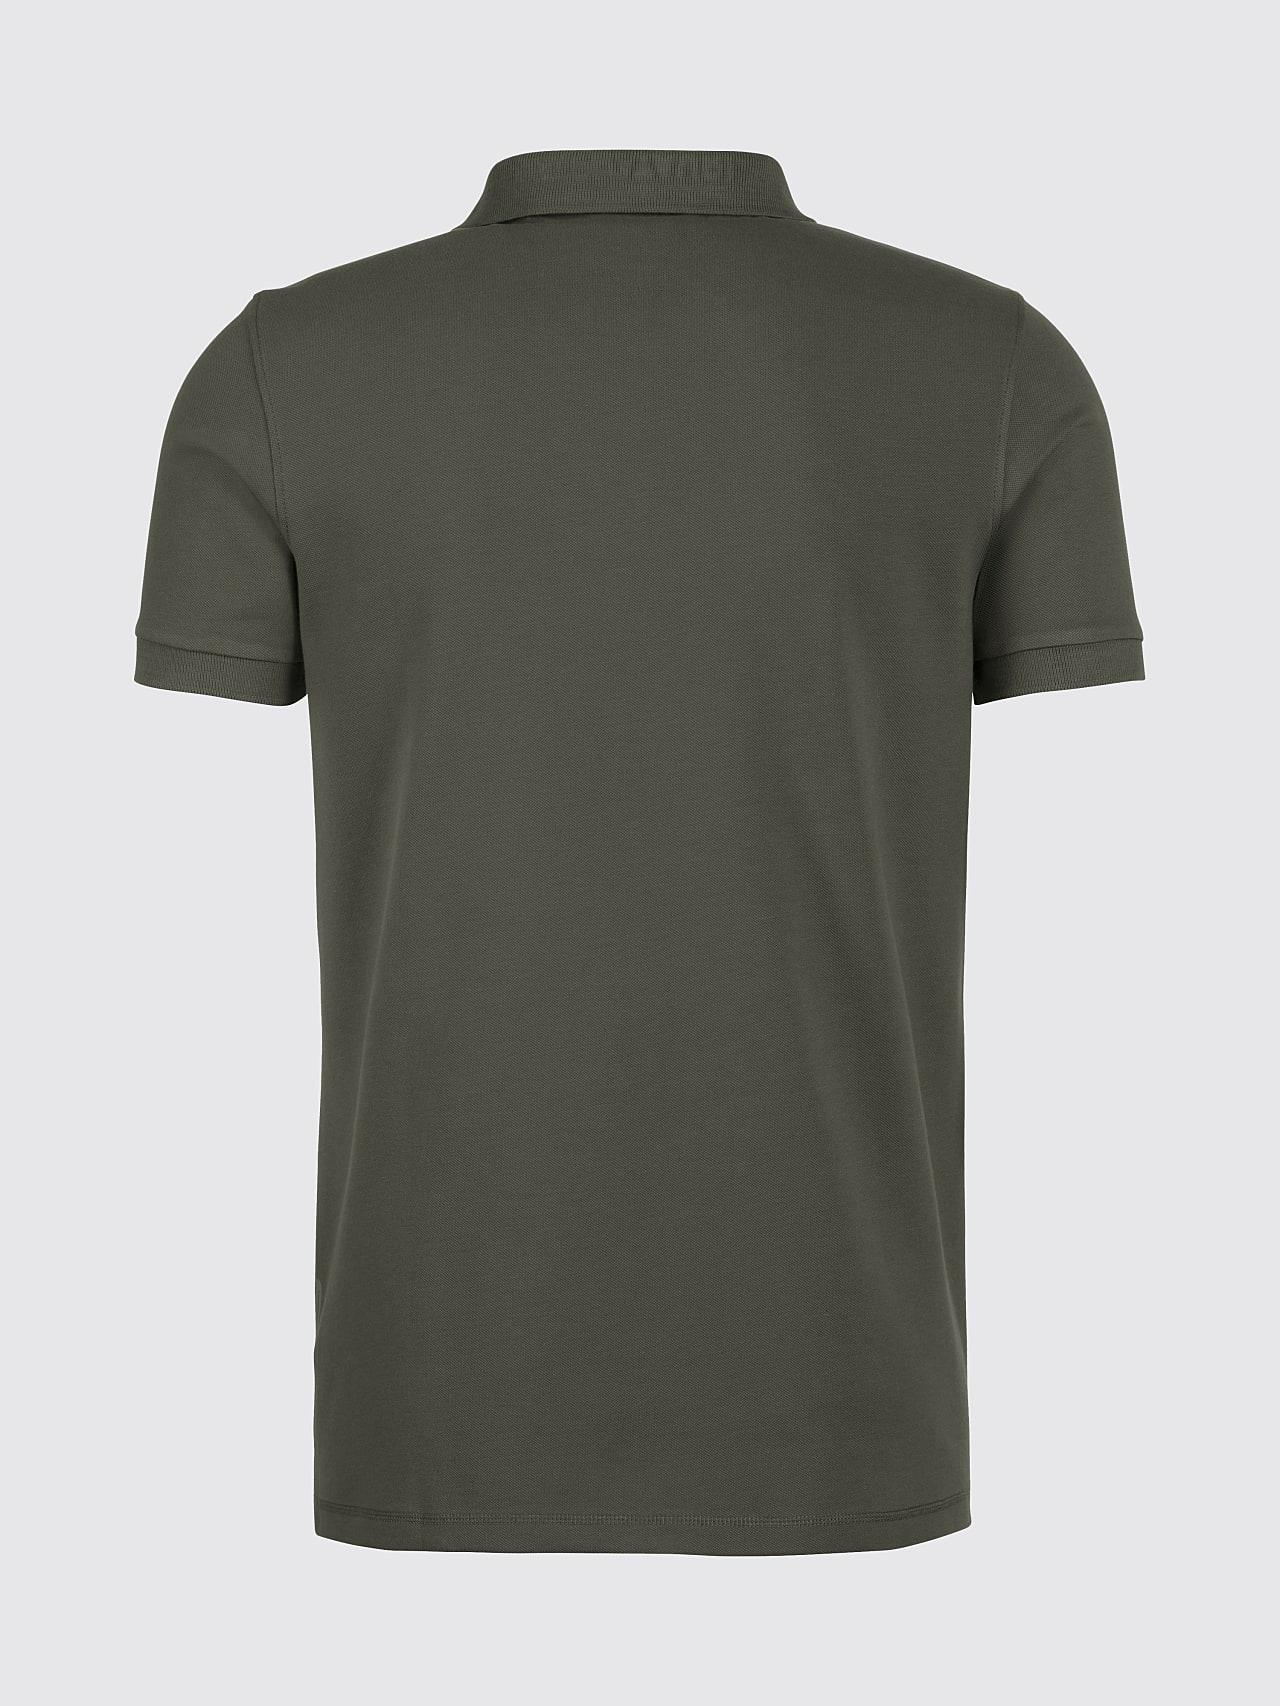 JANX V4.Y5.01 Short-Sleeve Polo Grey Left Alpha Tauri